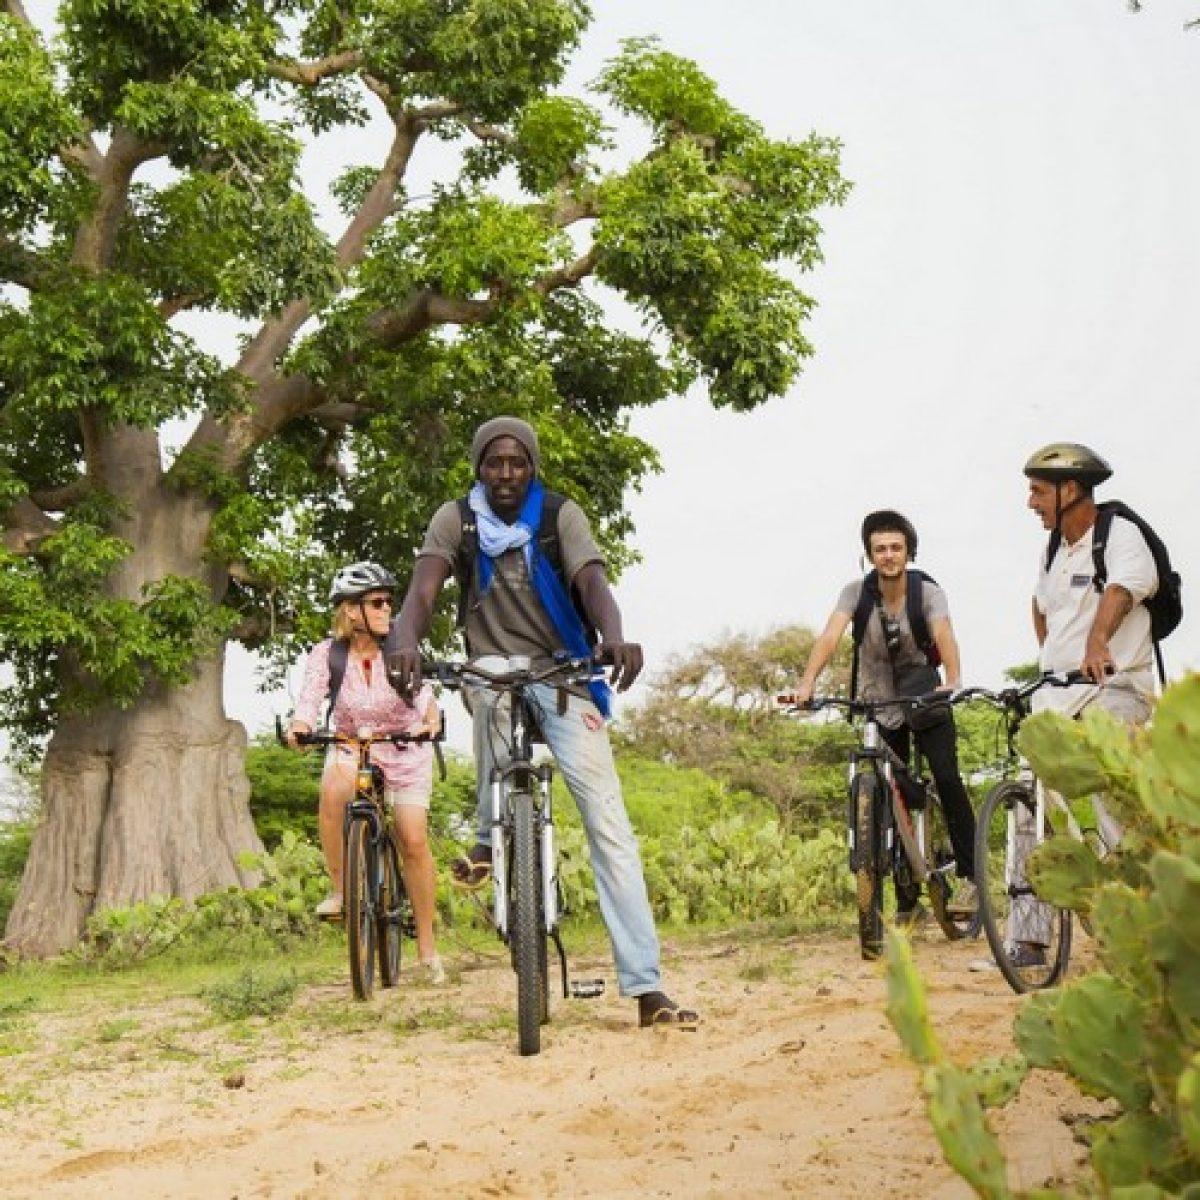 Aventura de Bici - Una jornada